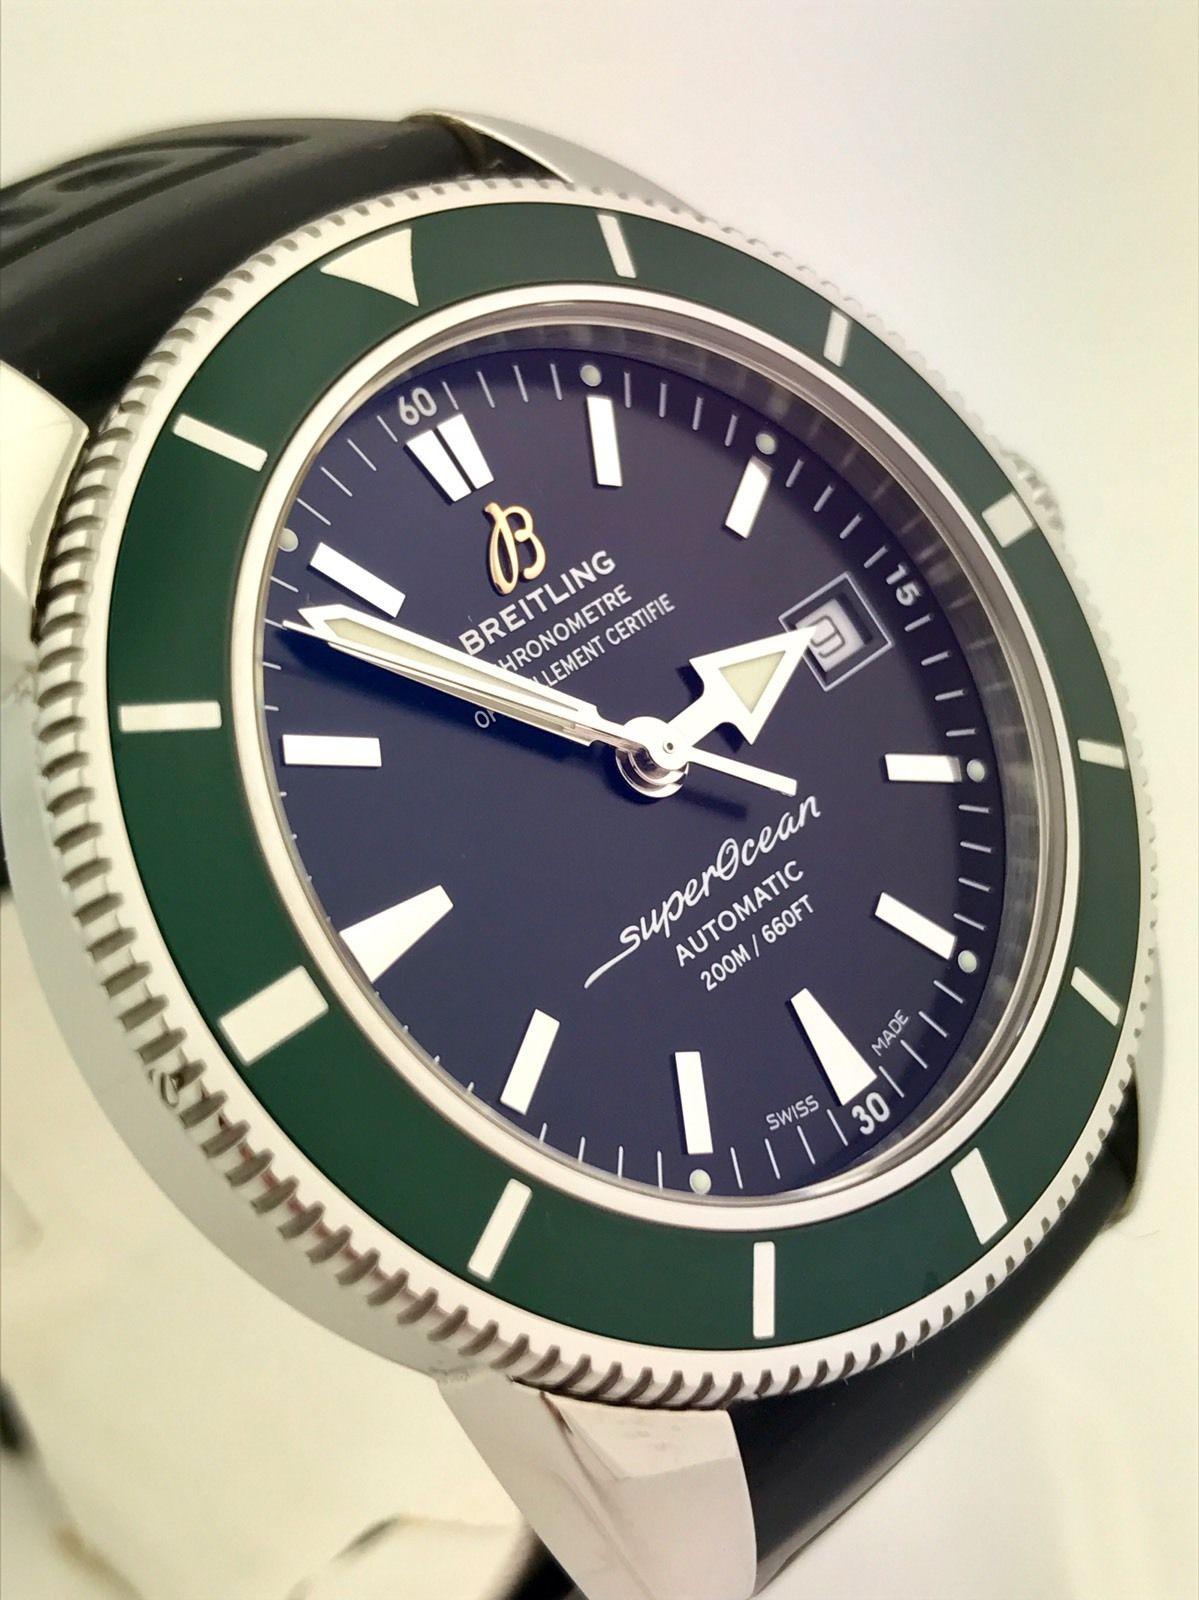 s l1600 4 3 - Breitling SuperOcean Heritage